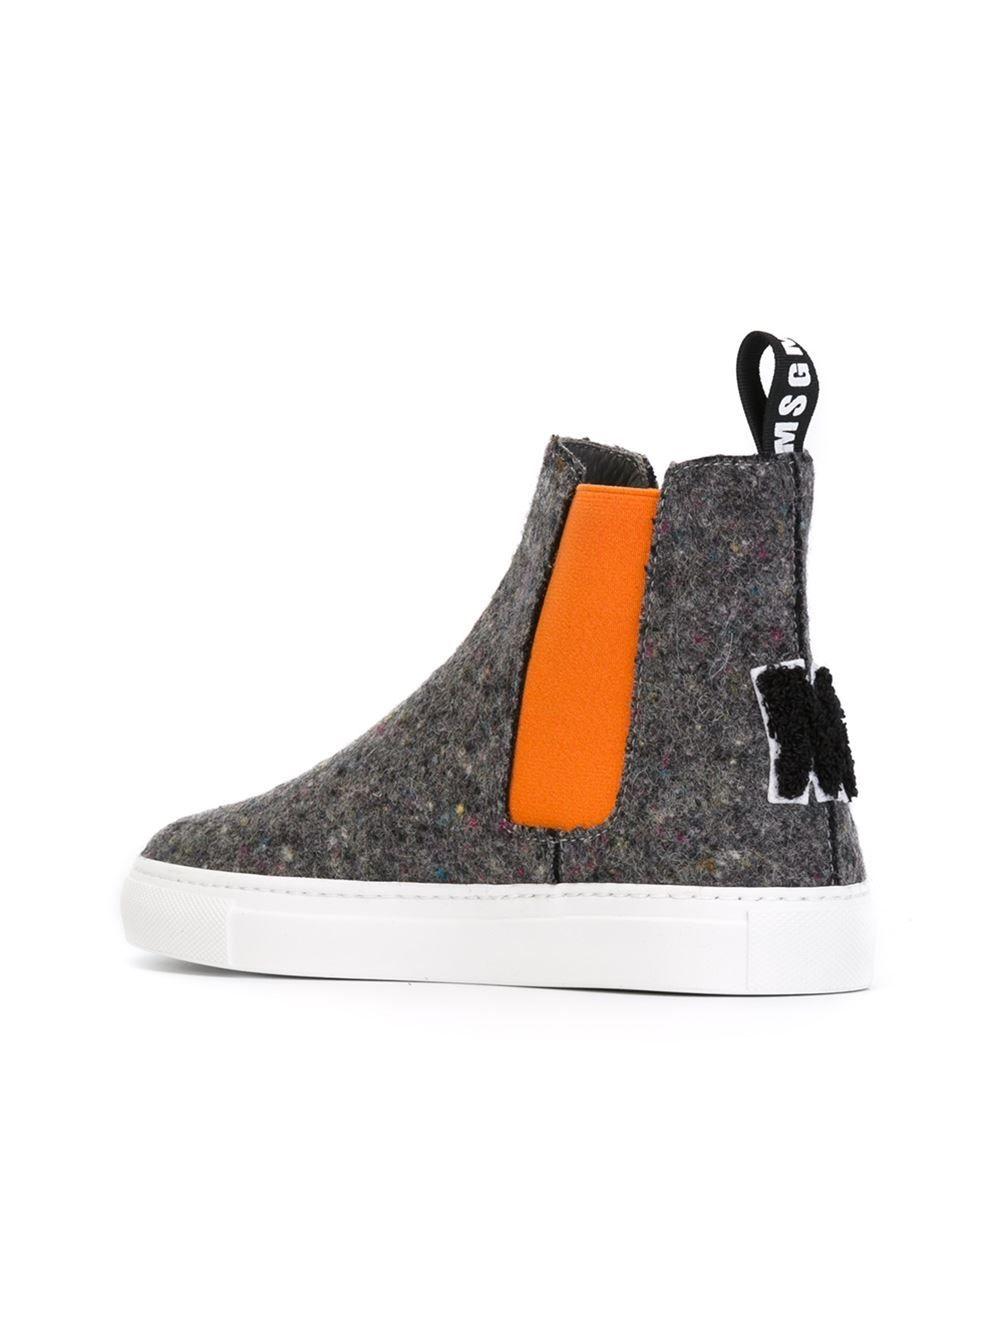 Msgm Felt Hi-top Sneakers - Monti - Farfetch.com